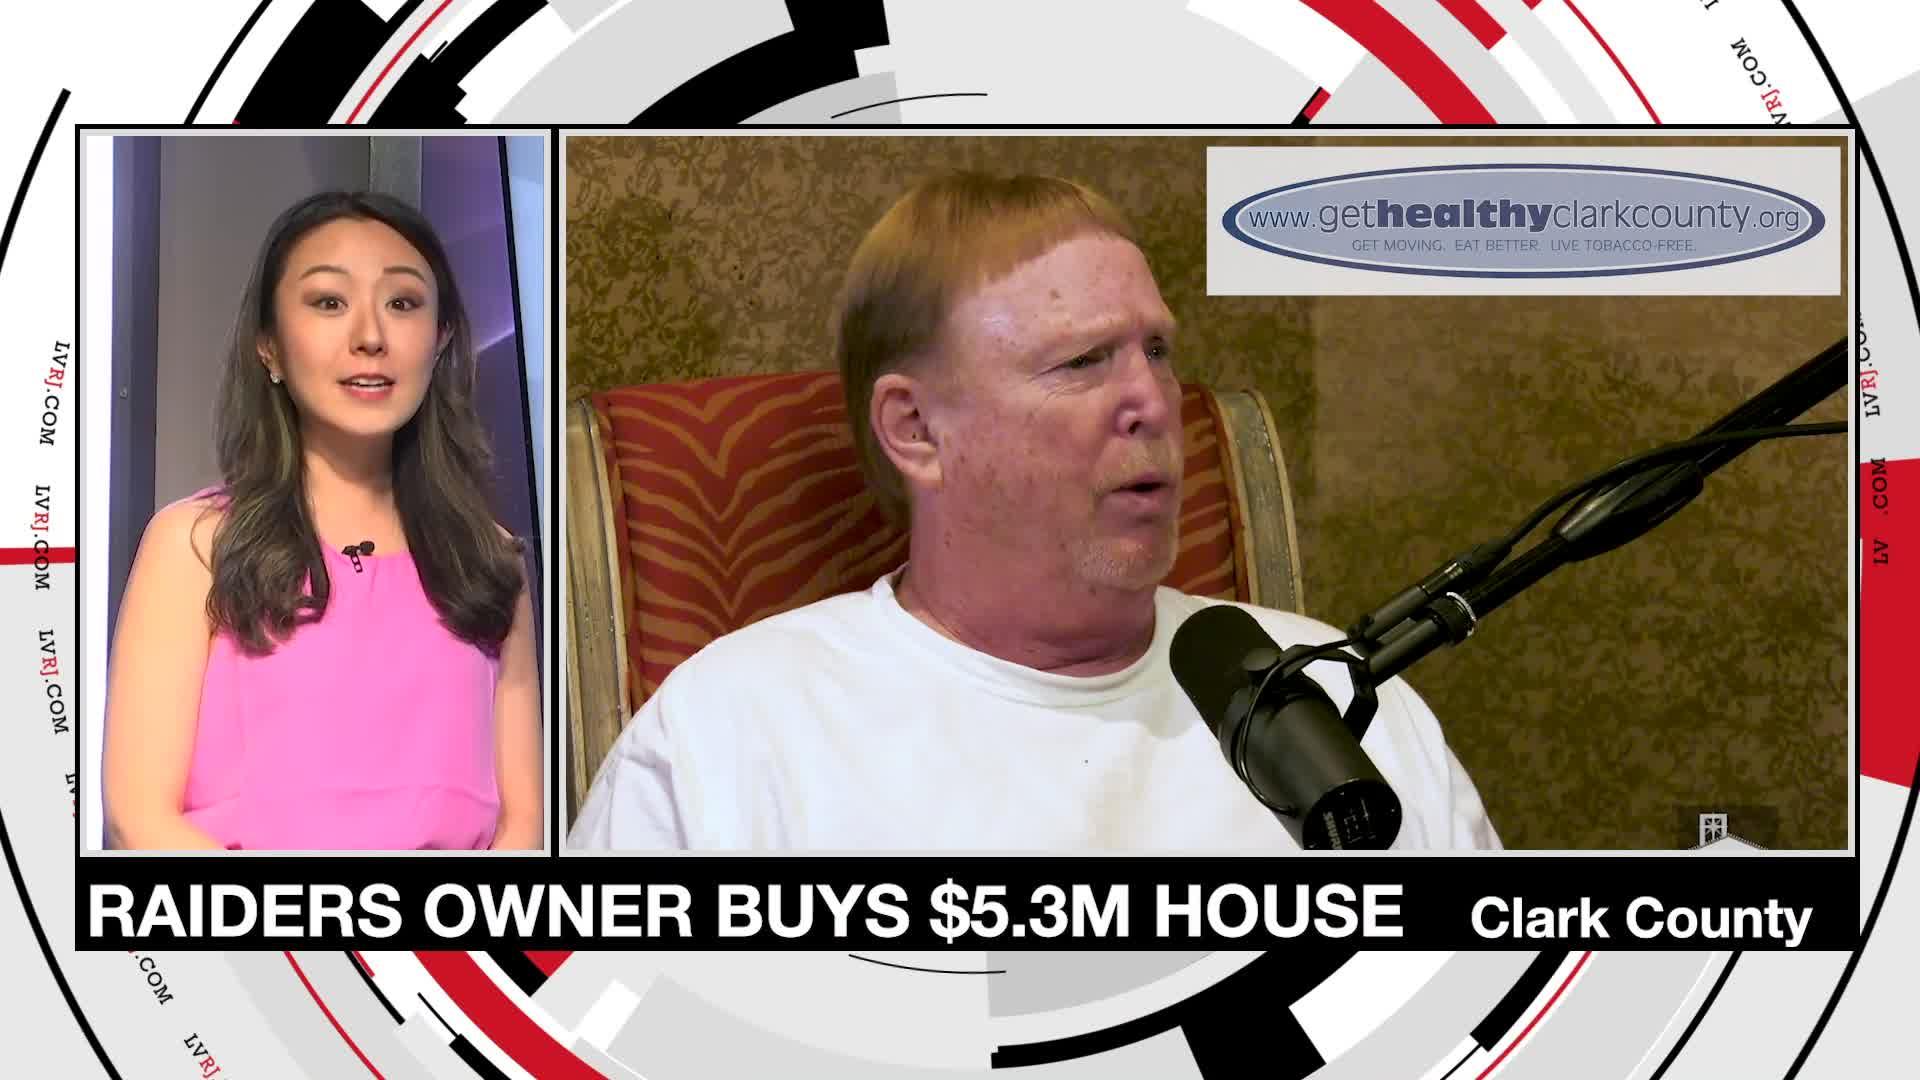 7@7PM Raiders Owner Mark Davis Buys $5.3M House